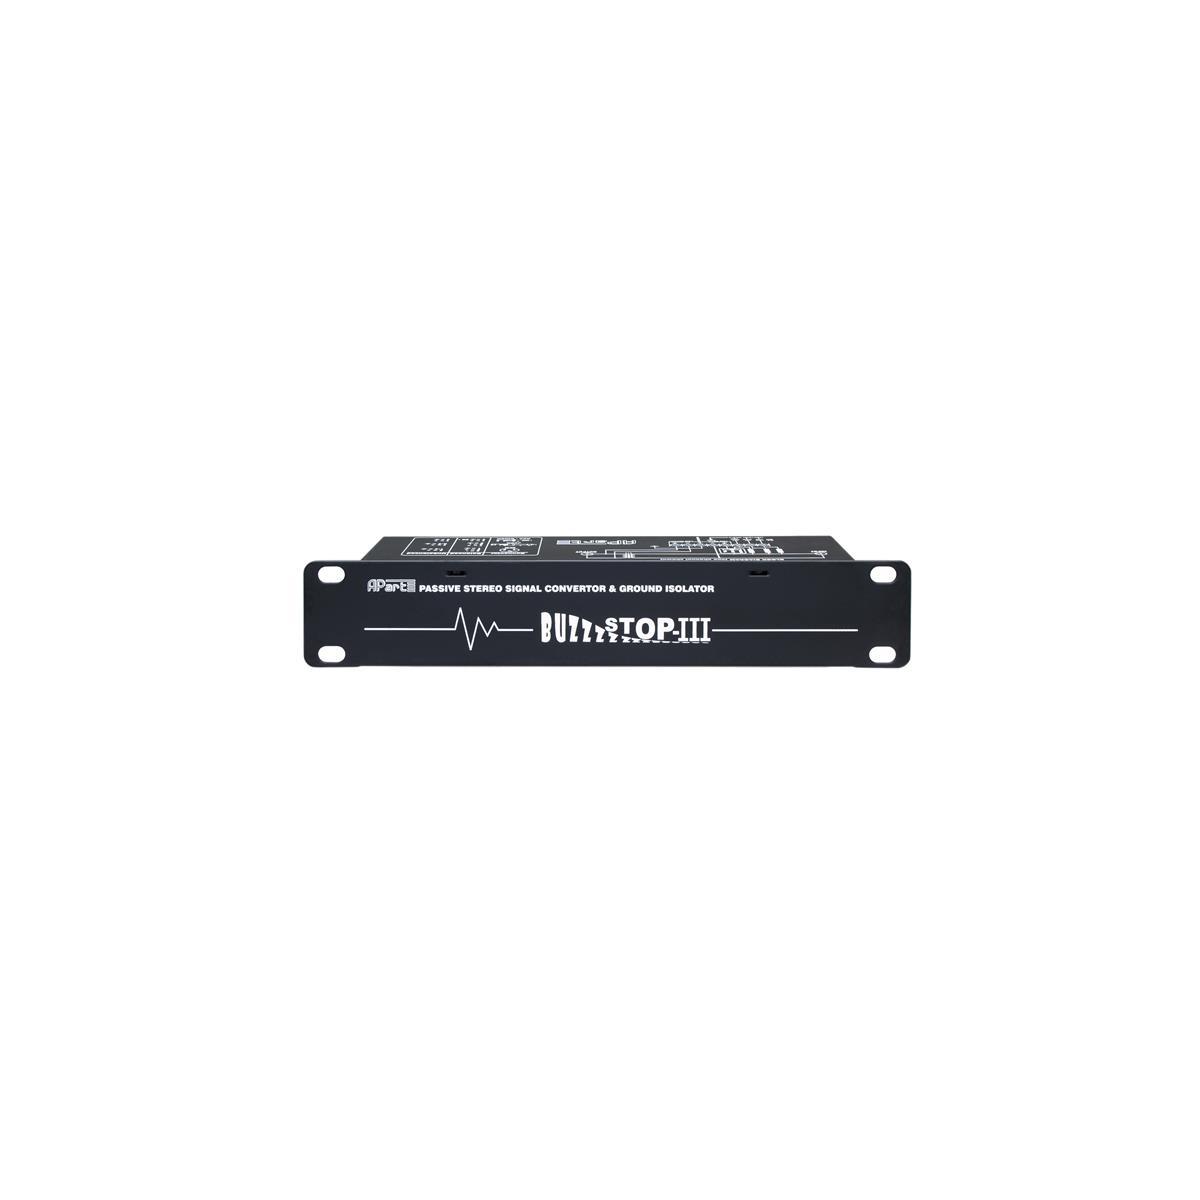 Apart BUZZSTOP MKIII Signal Convert. Isolator